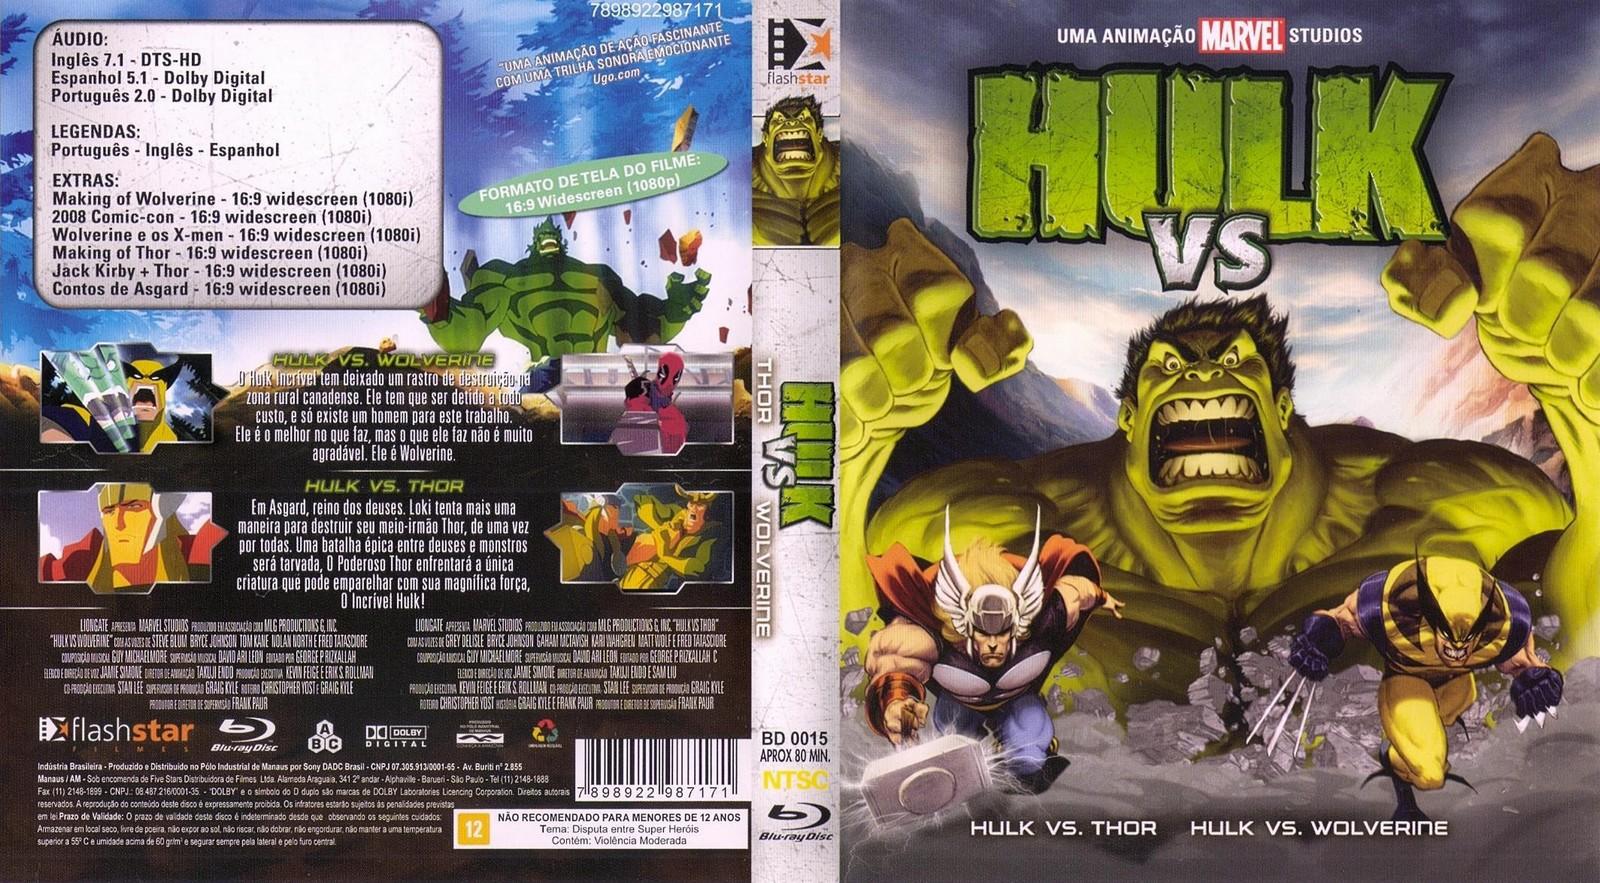 http://1.bp.blogspot.com/-Segum711CEk/TnCujHM69OI/AAAAAAAACW4/lZDKw3Ct9Ho/s1600/Hulk-Vs-Thor-Vs-Wolverine.jpg